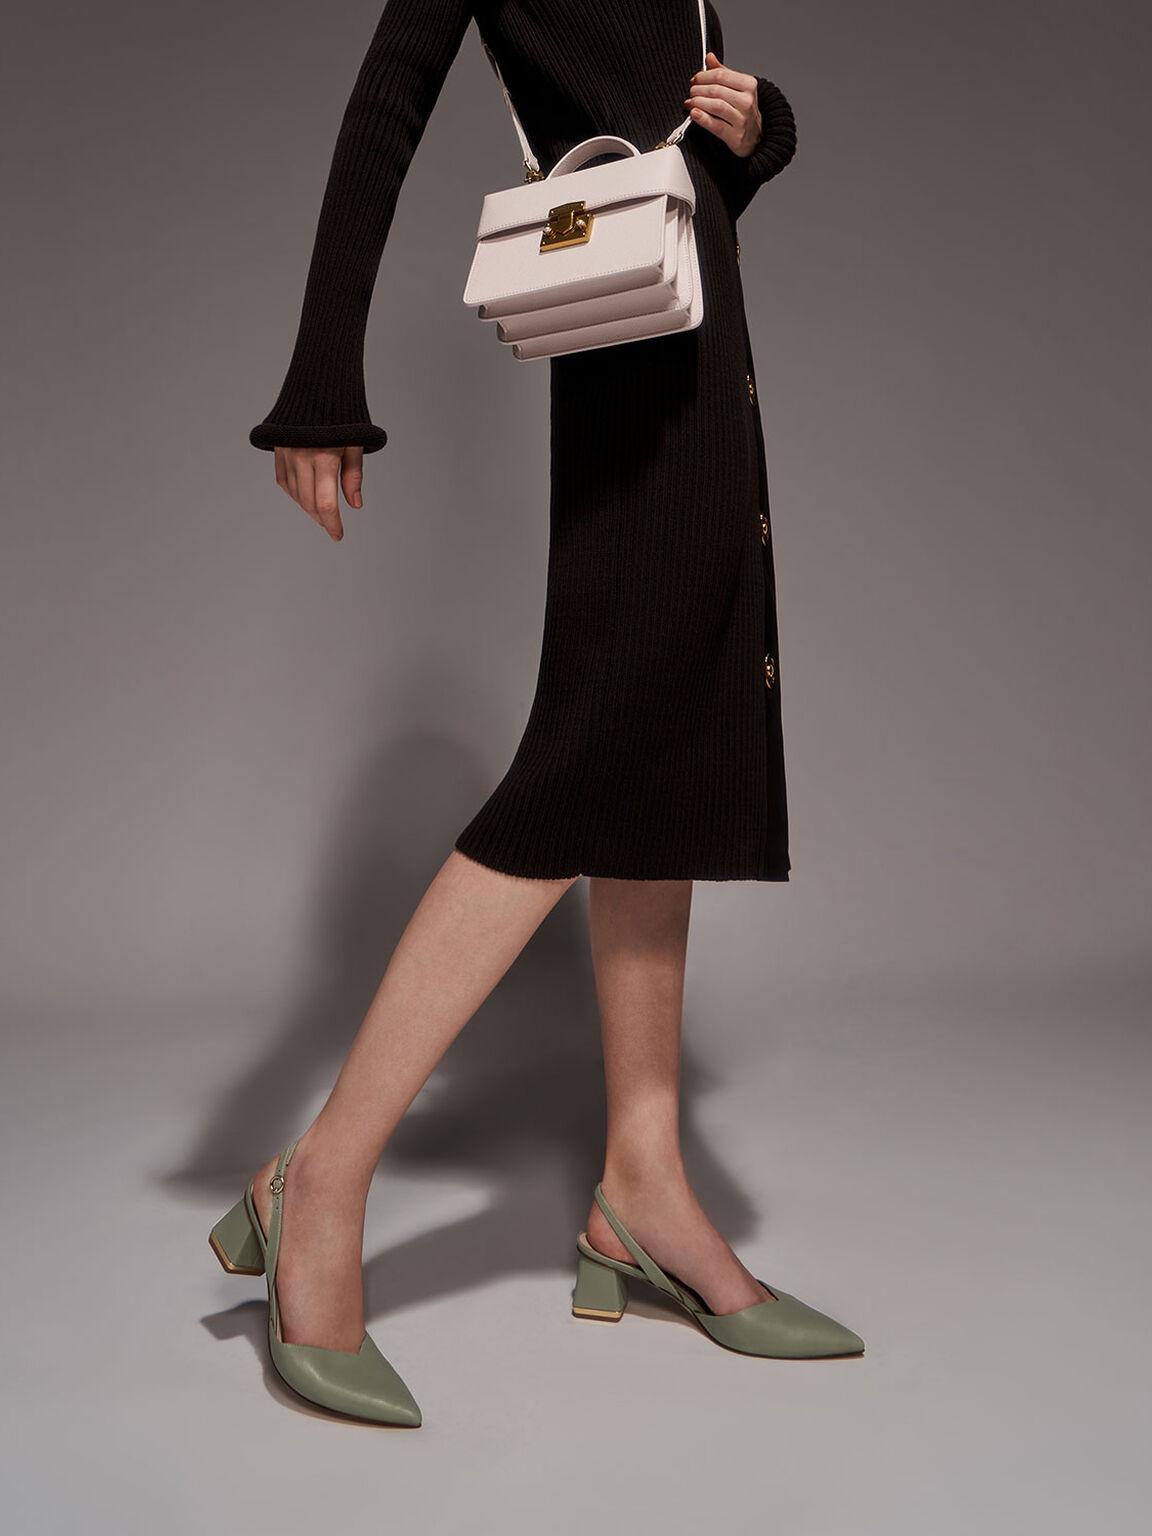 V字後踝帶跟鞋, 灰綠色, hi-res